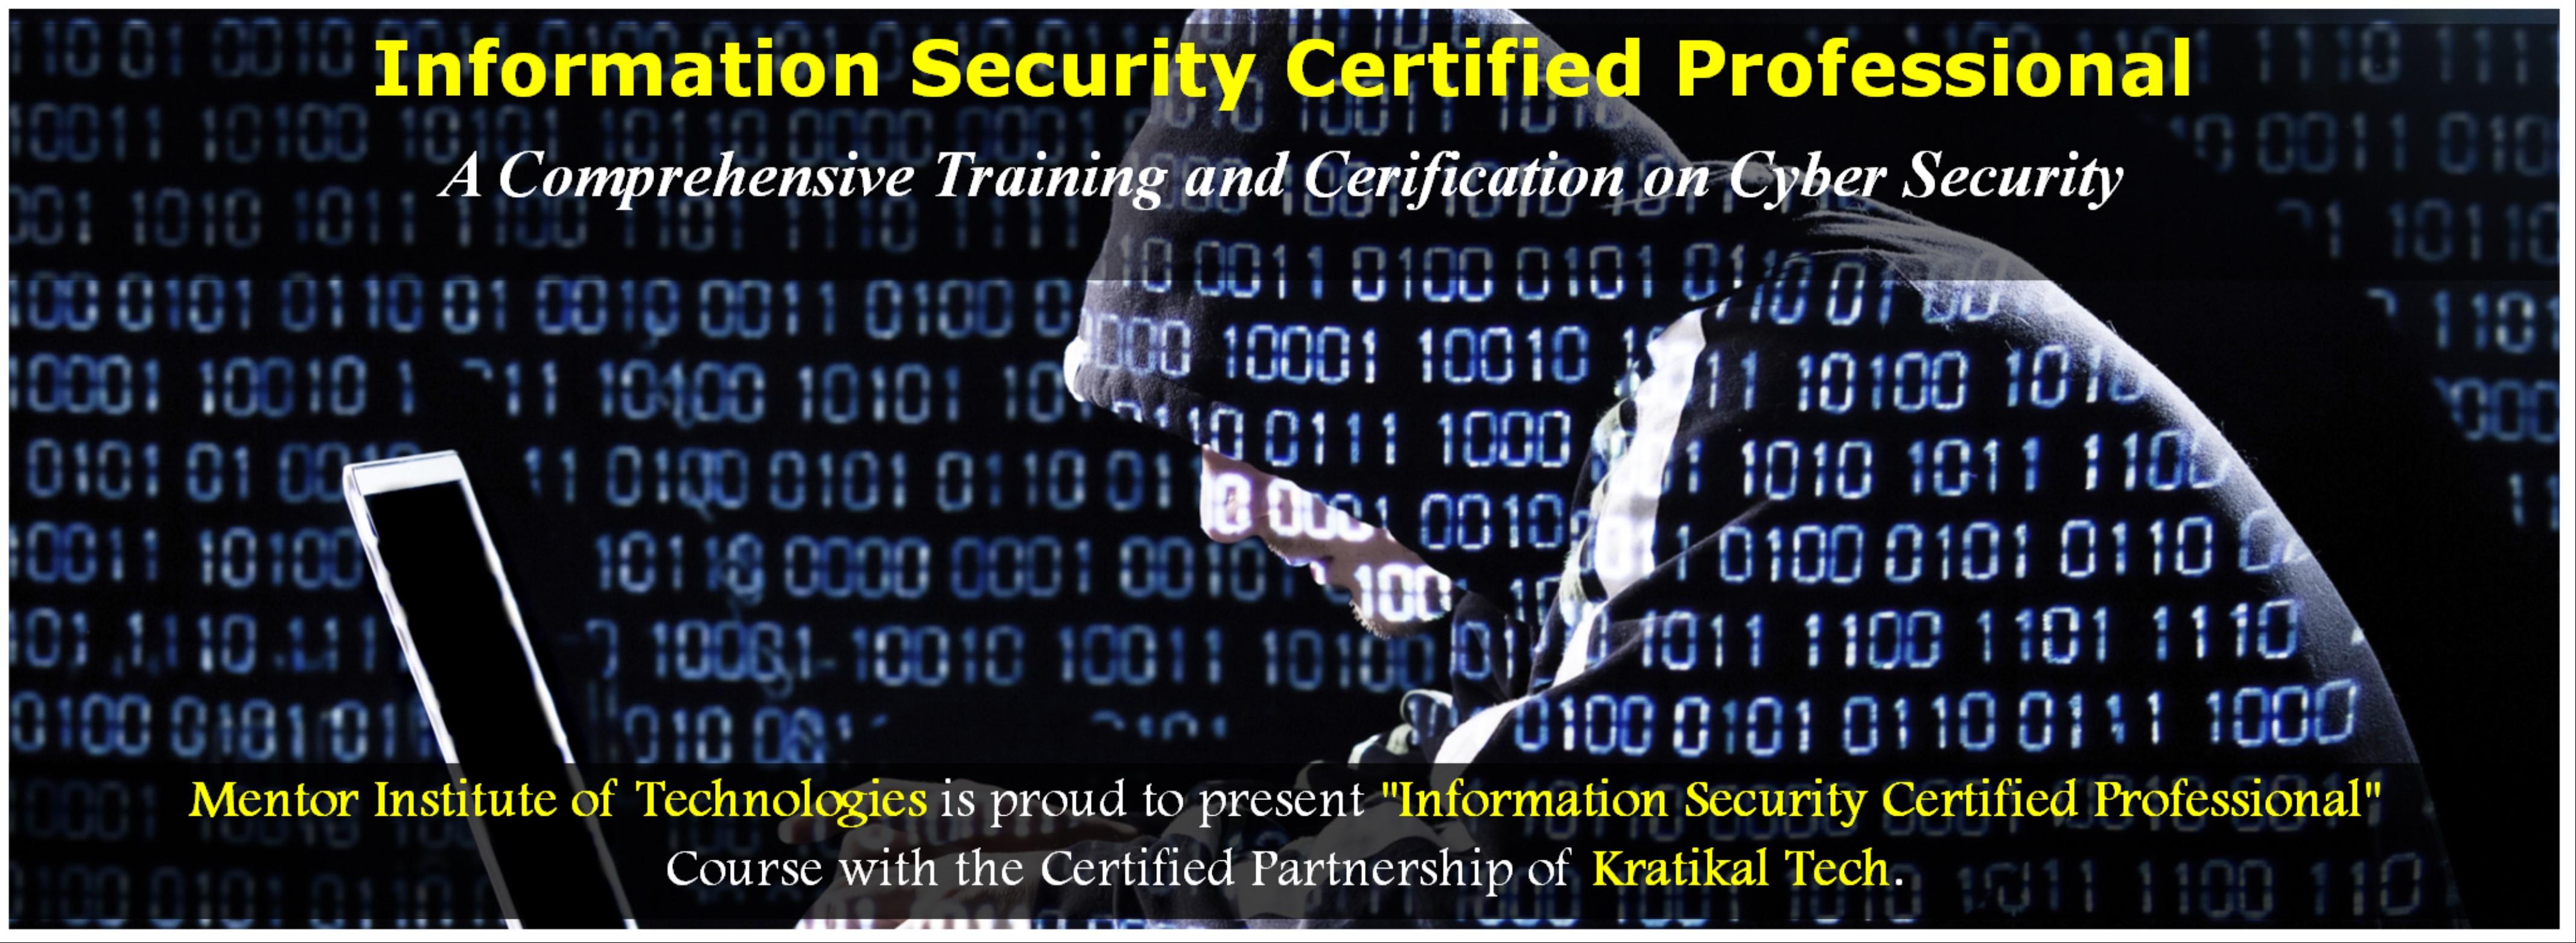 ISCP Training in Nepal